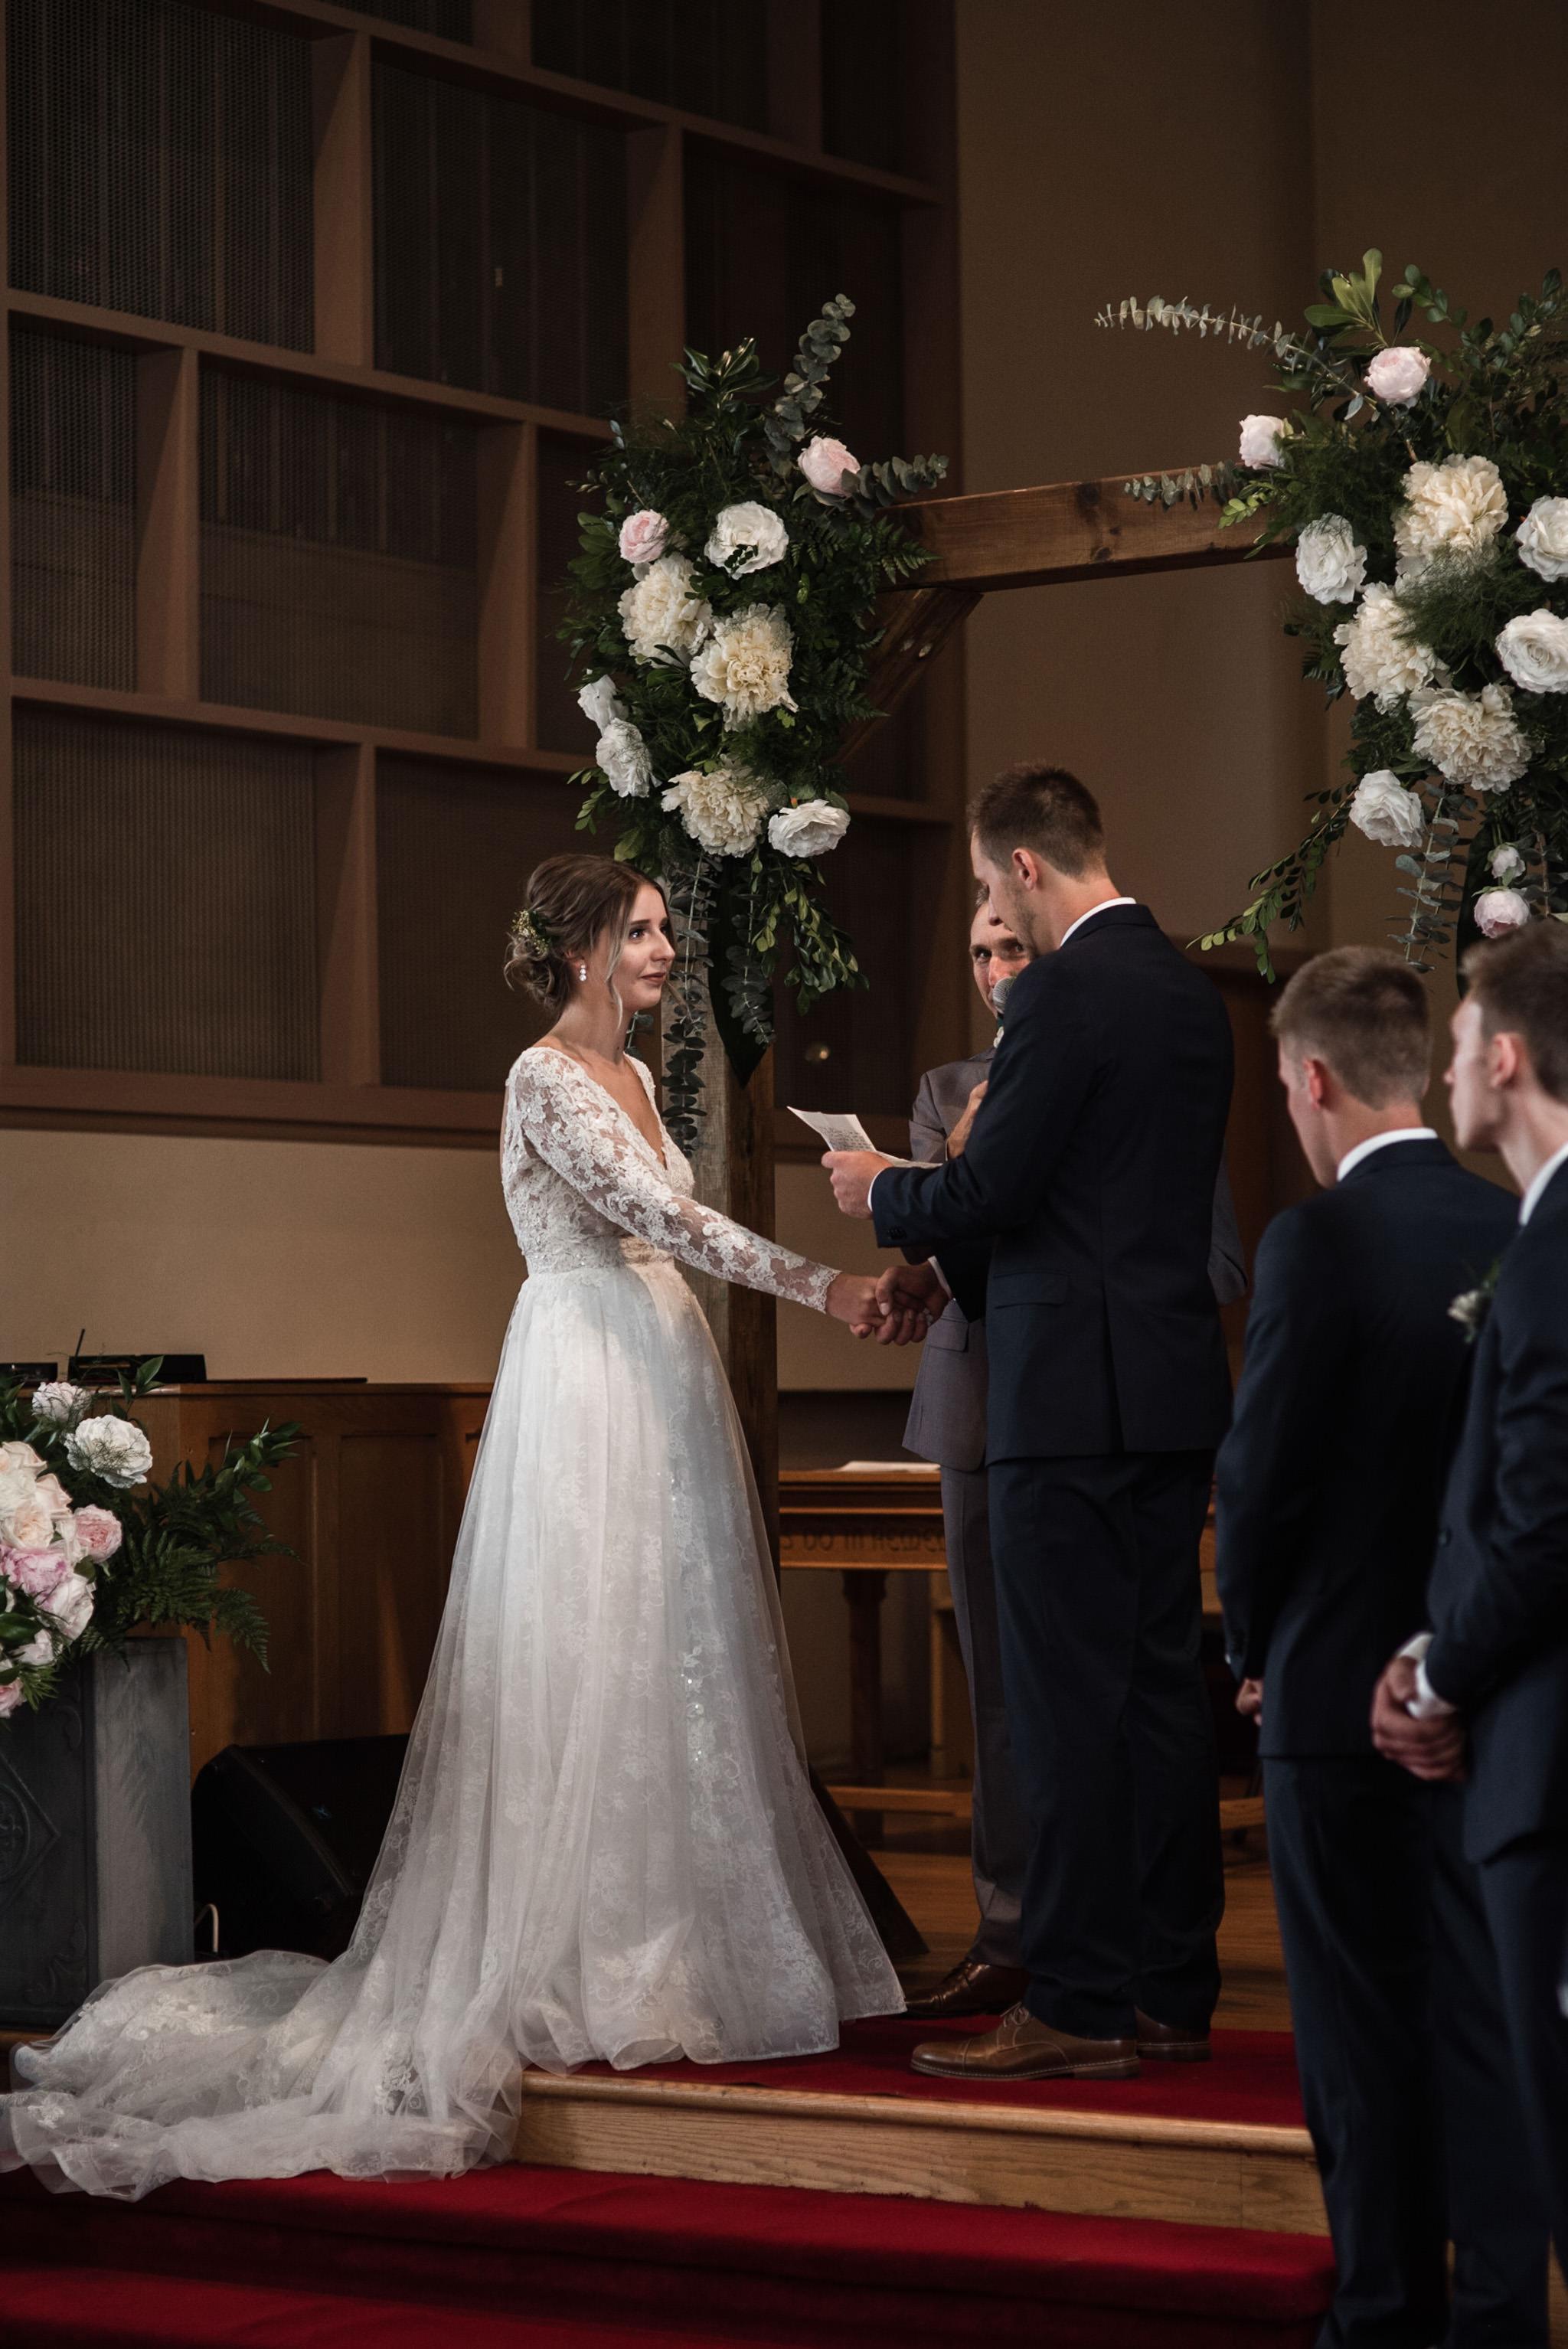 181-wedding-ceremony-candids-wooden-arch-in-church.jpg